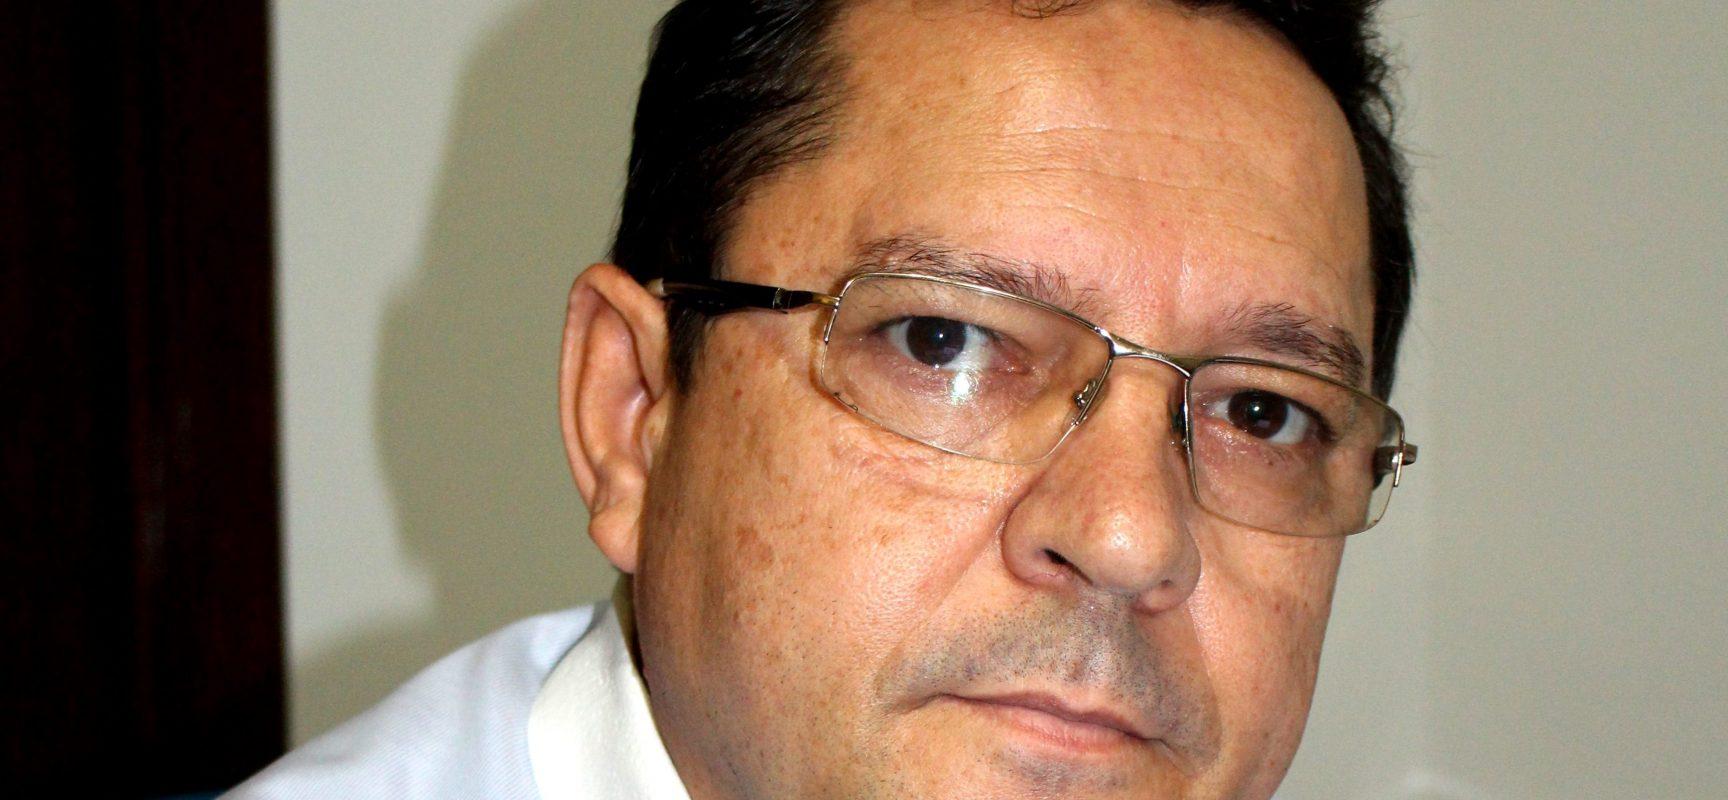 * Dr. Luciano Veiga: Cavalete Modal do Sul da Bahia, seus desafios!